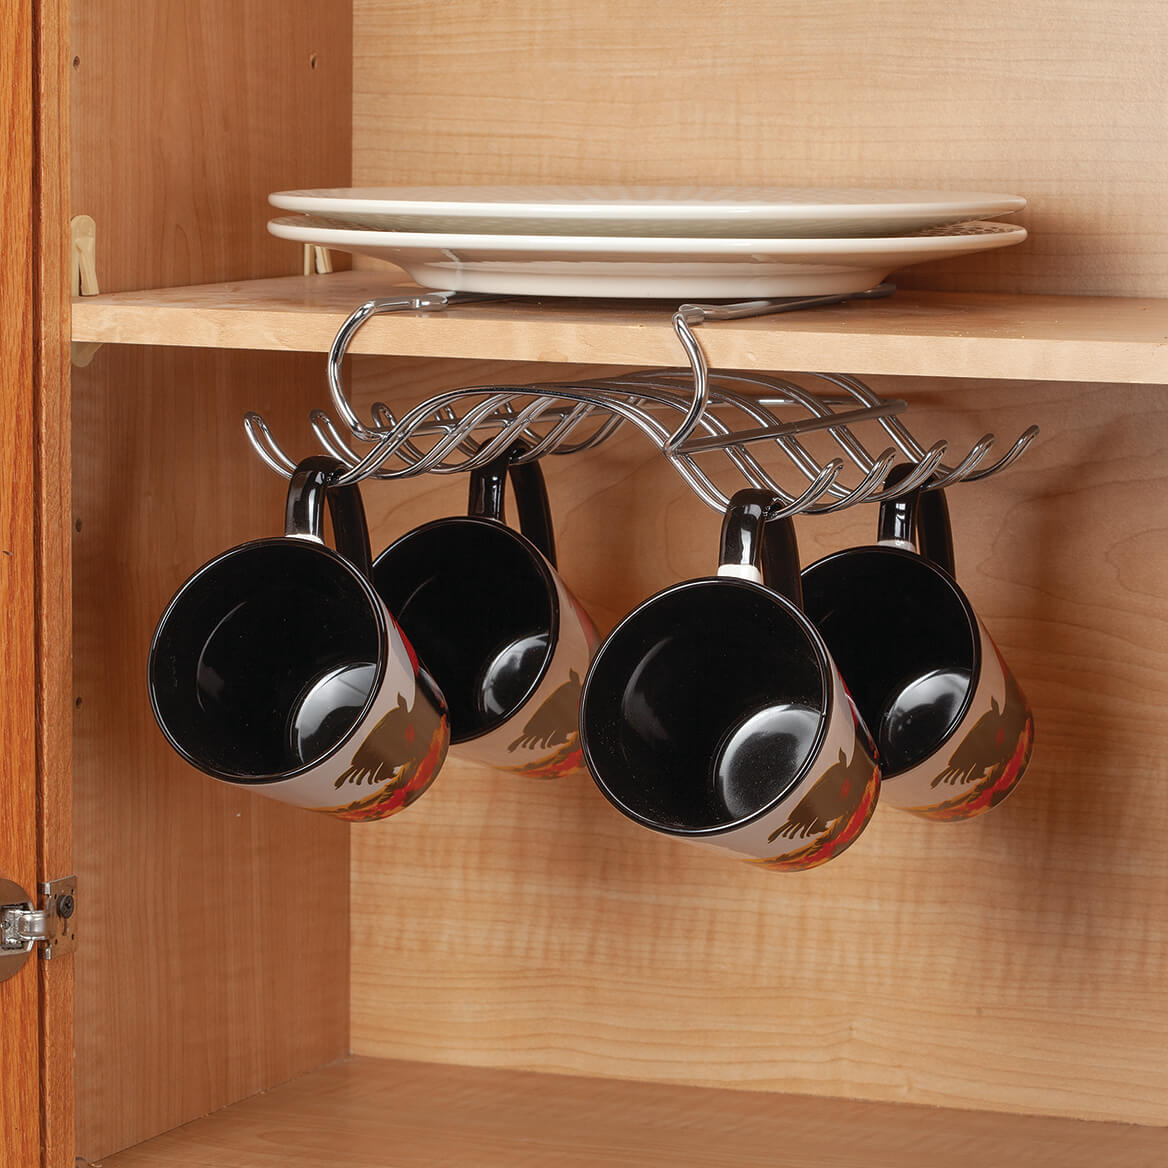 Chrome Under Cabinet Mug Holder-371109